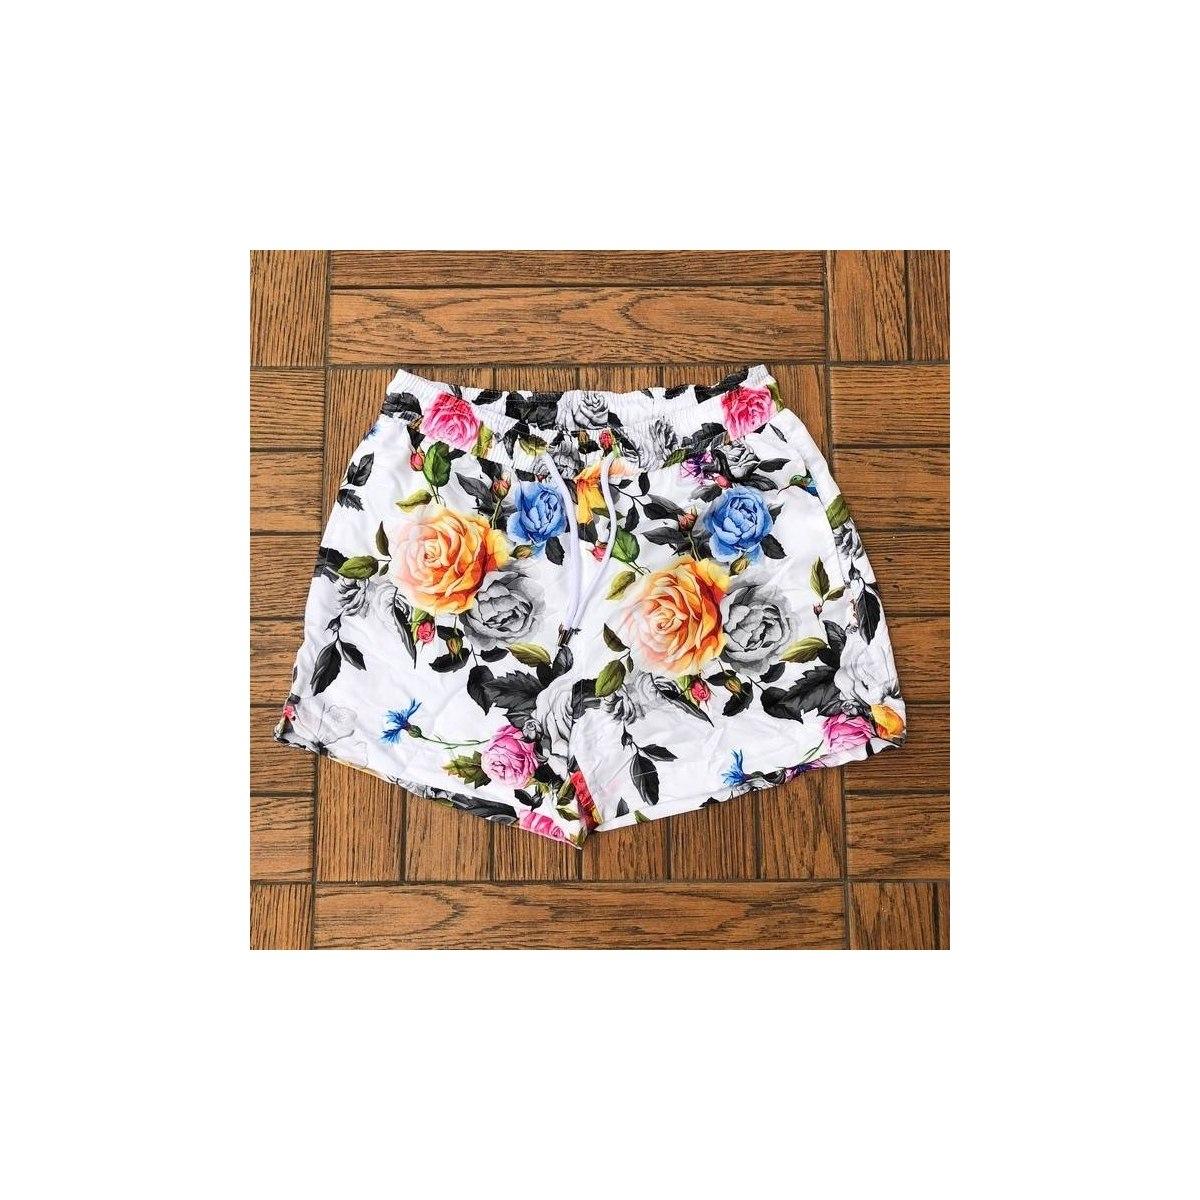 Men's Swim Shorts With Colored Flower Print MV Swimwear Collection - 1